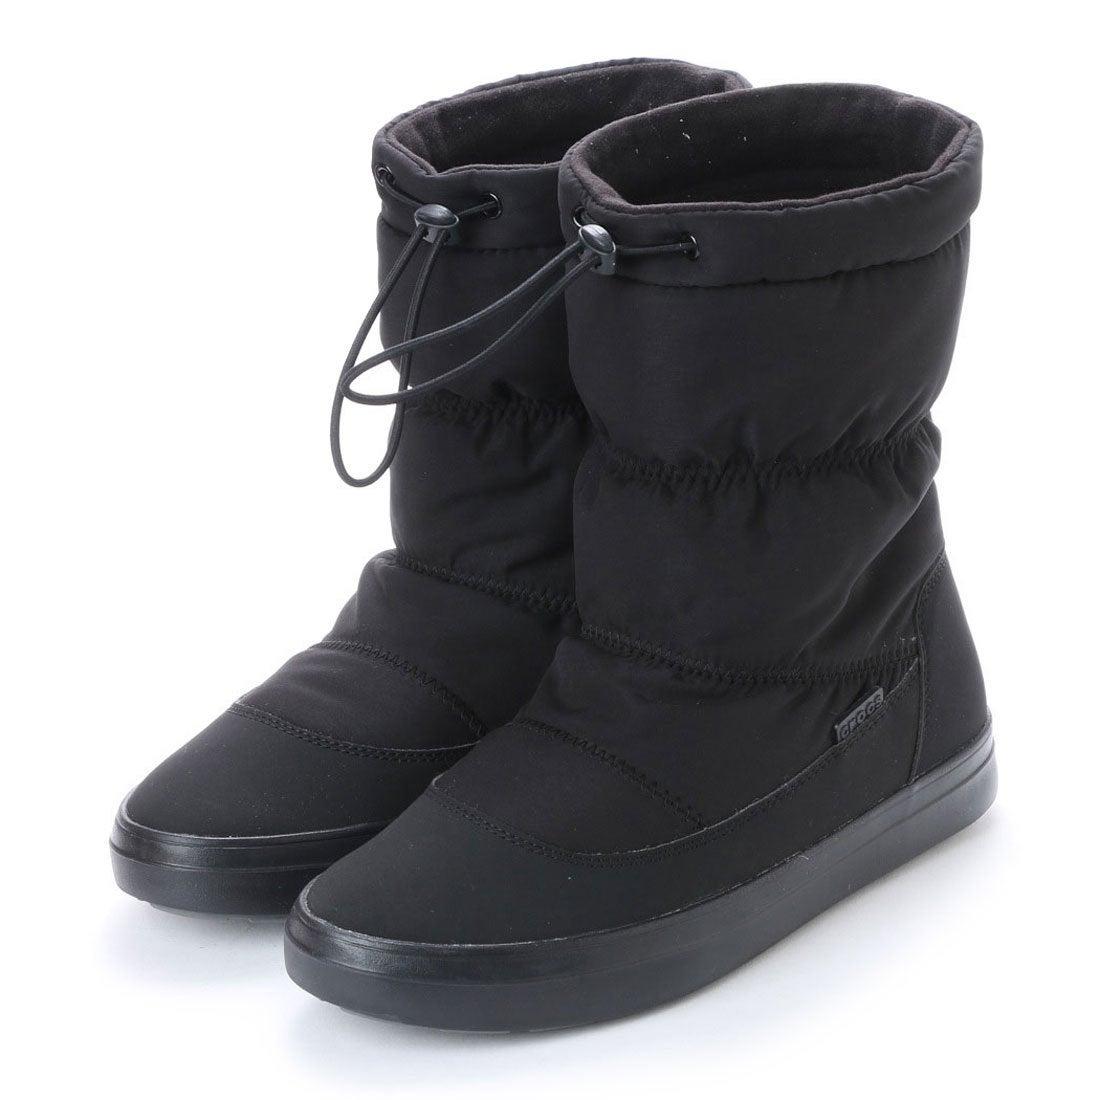 8b85081368cb26 crocs クロックス CROCS レディース ロングブーツ WINTER lodgepoint pull-on boot w 203422-001  4403 -レディースファッション通販 ロコンドガールズコレクション ...